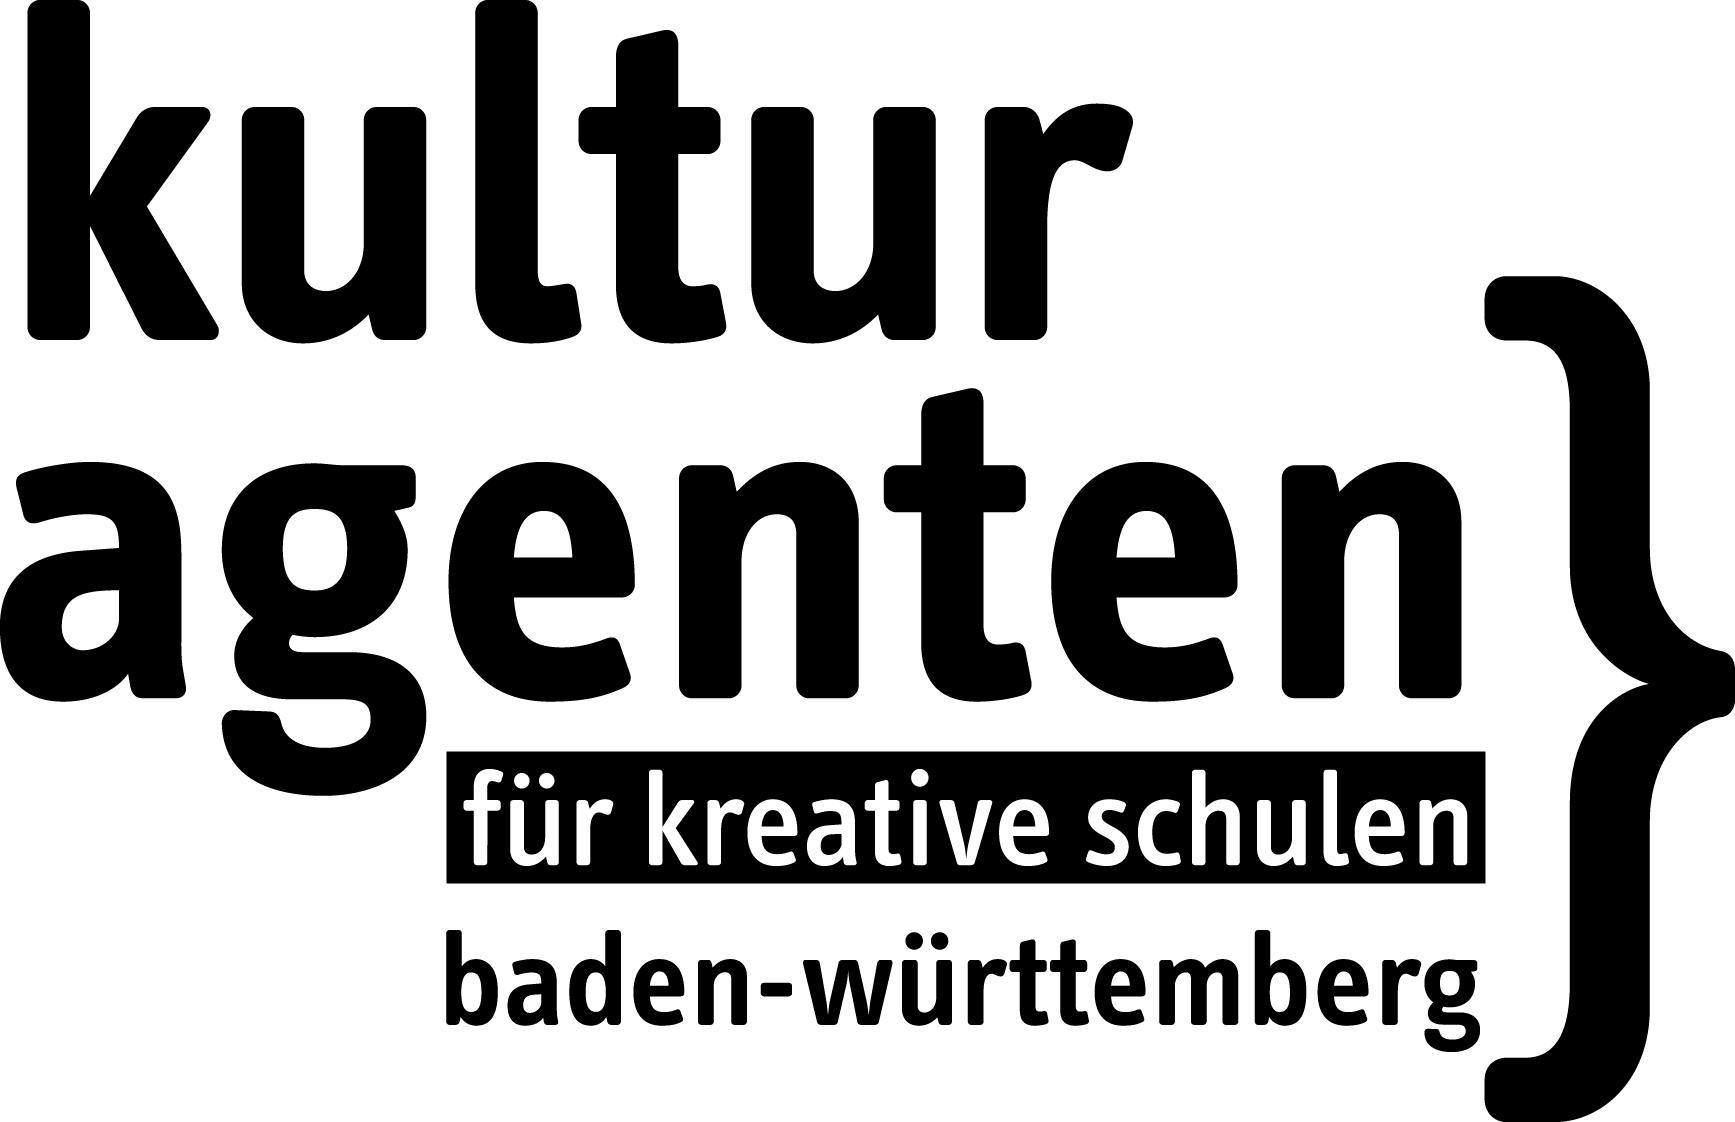 Kulturstiftung baden wurttemberg